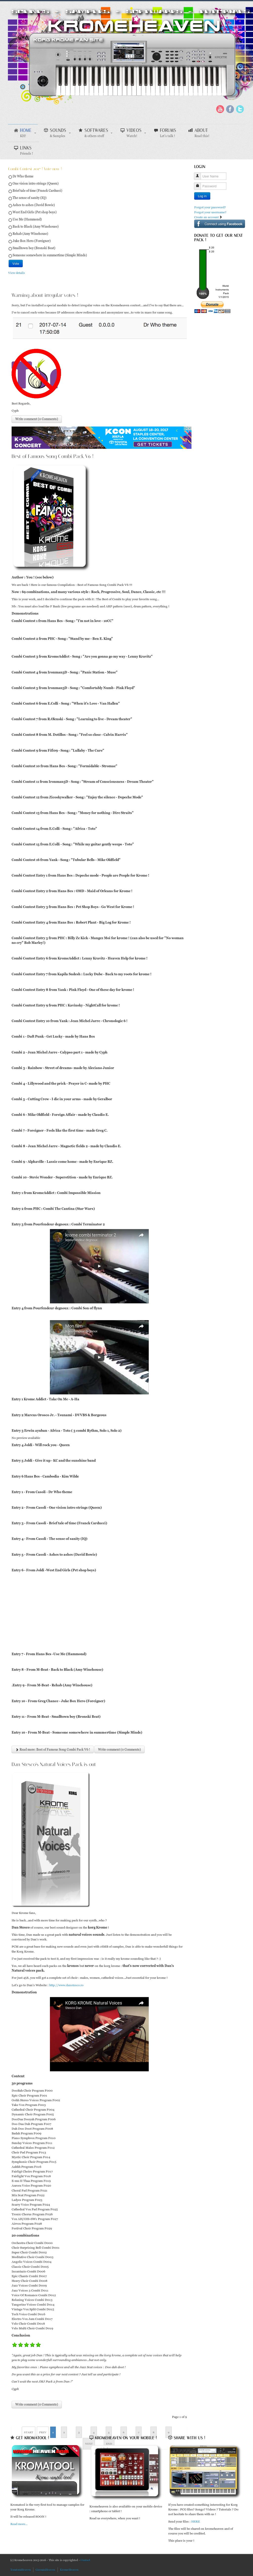 Owler Reports - Kromeheaven Korg Krome Site Blog Awesome B4 Hammond